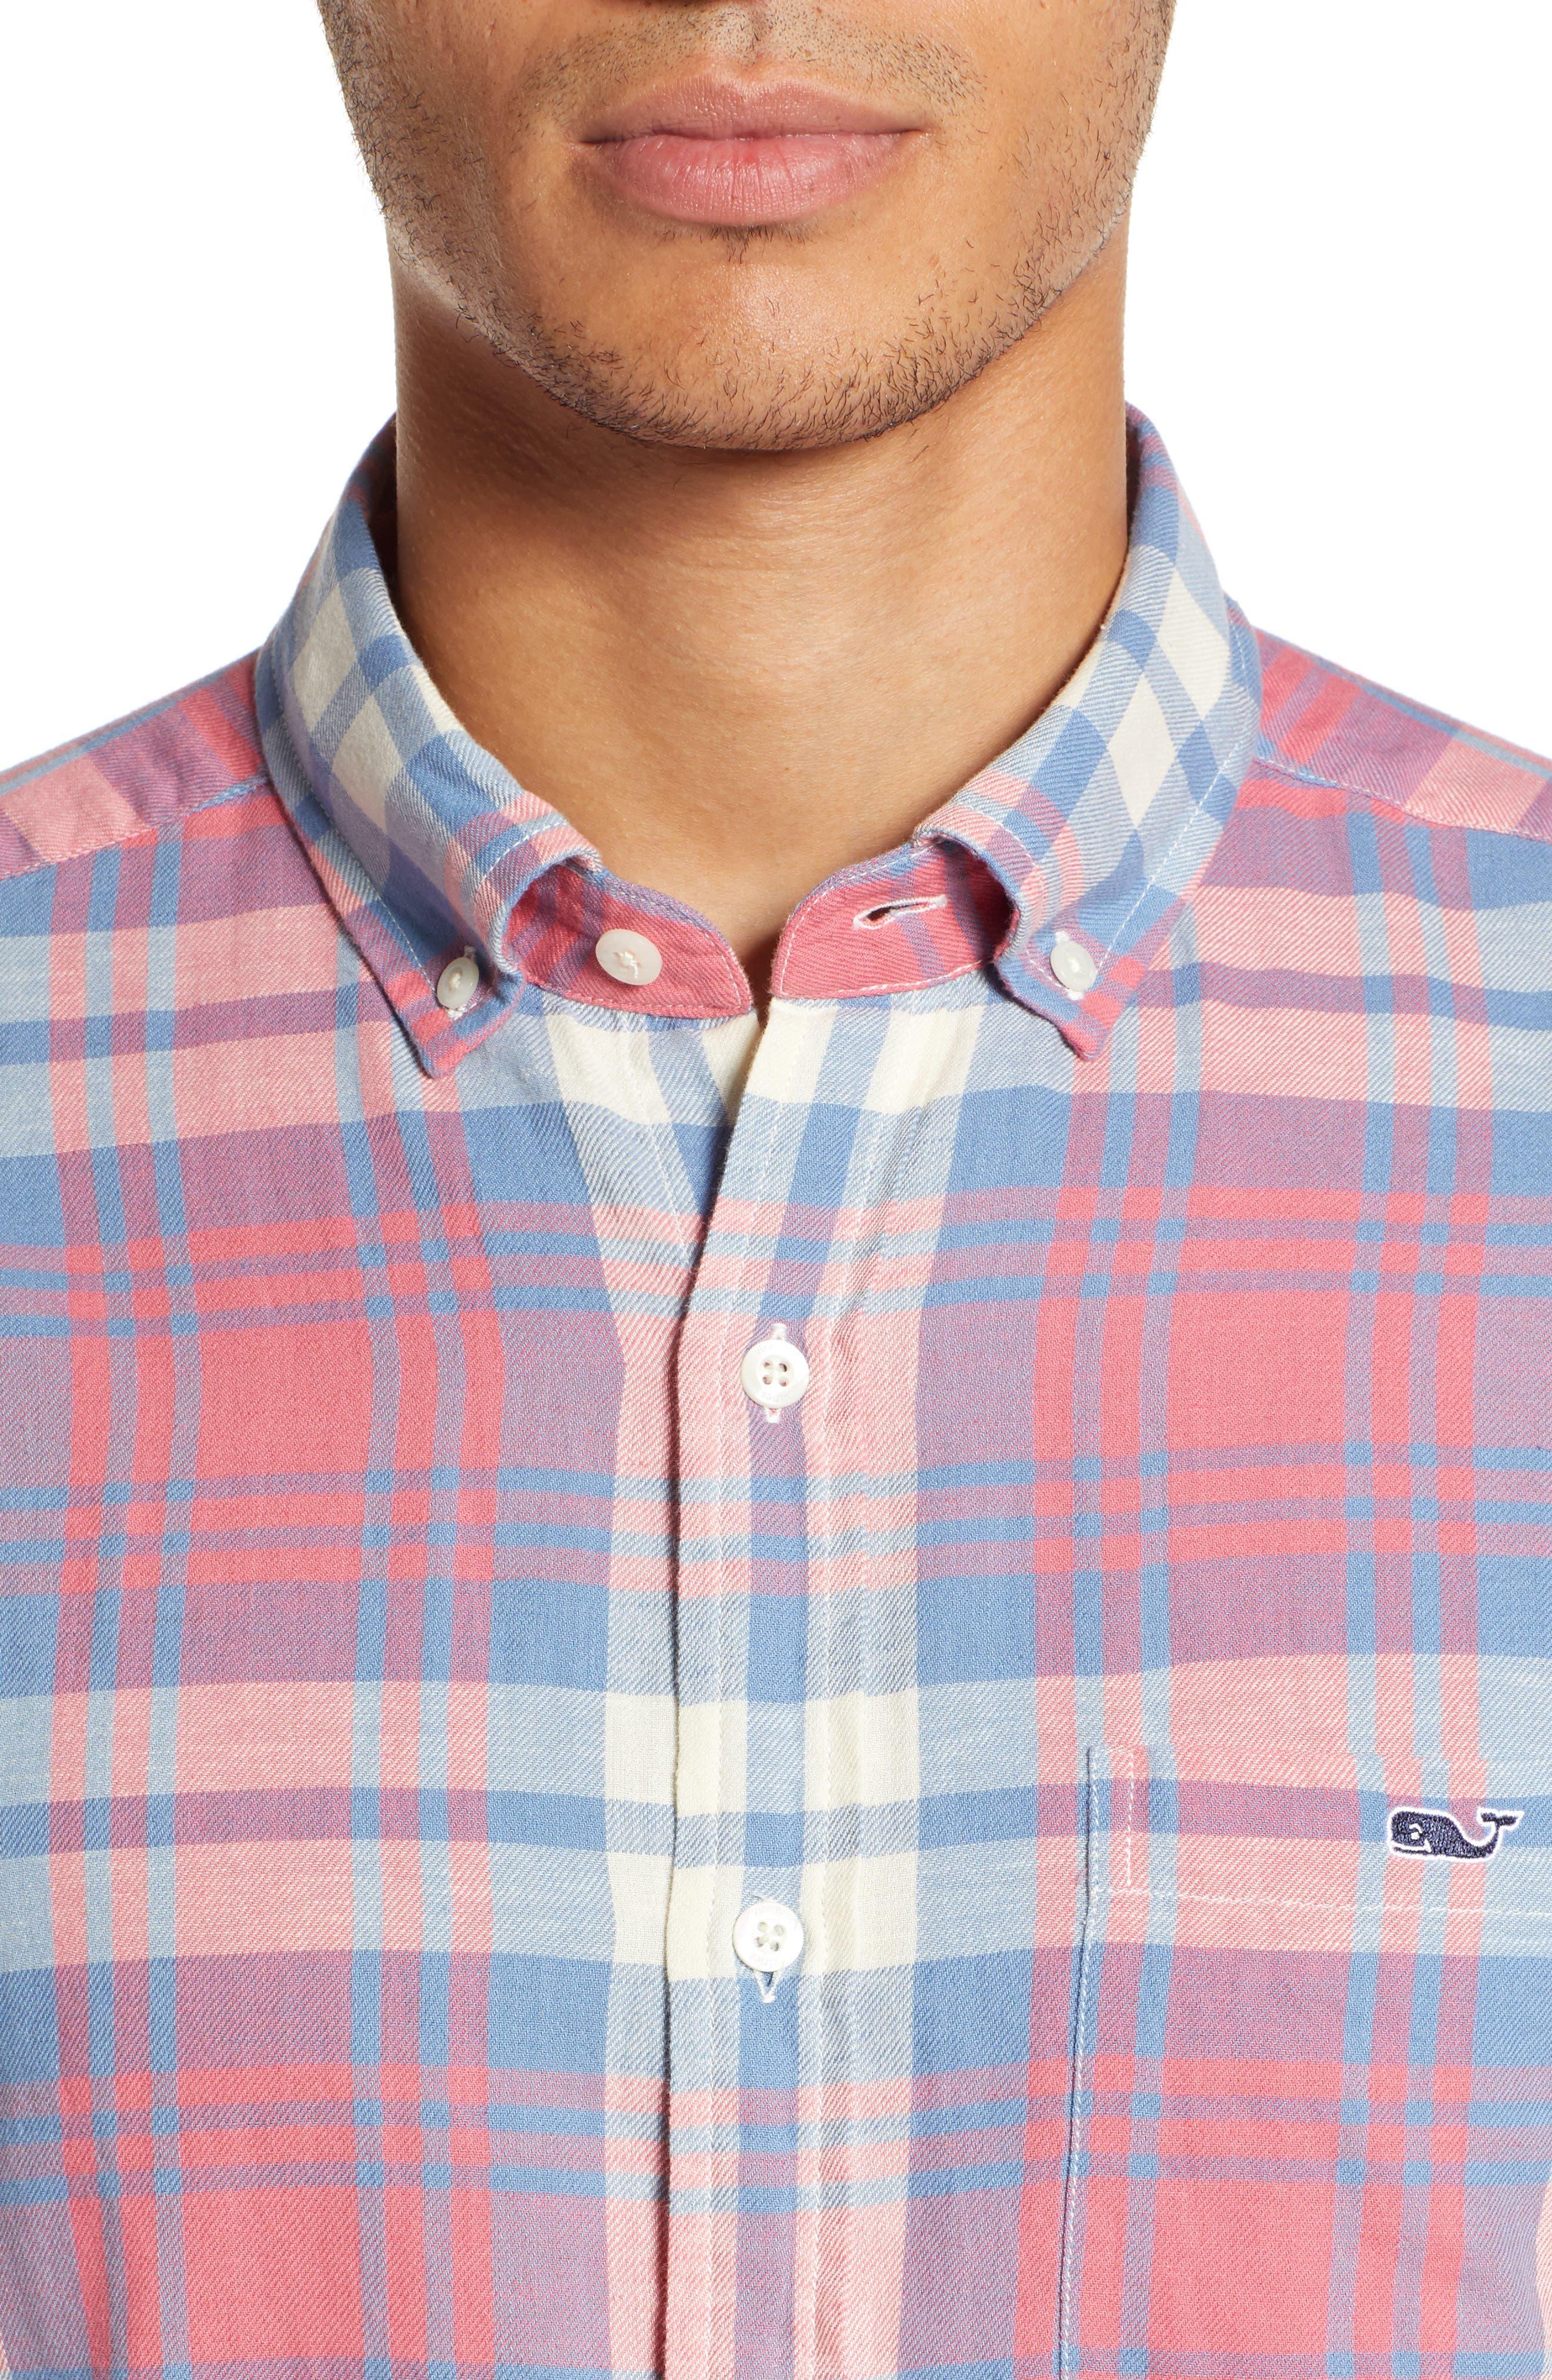 VINEYARD VINES, Kings Point Slim Fit Tucker Sport Shirt, Alternate thumbnail 2, color, LOBSTER REEF